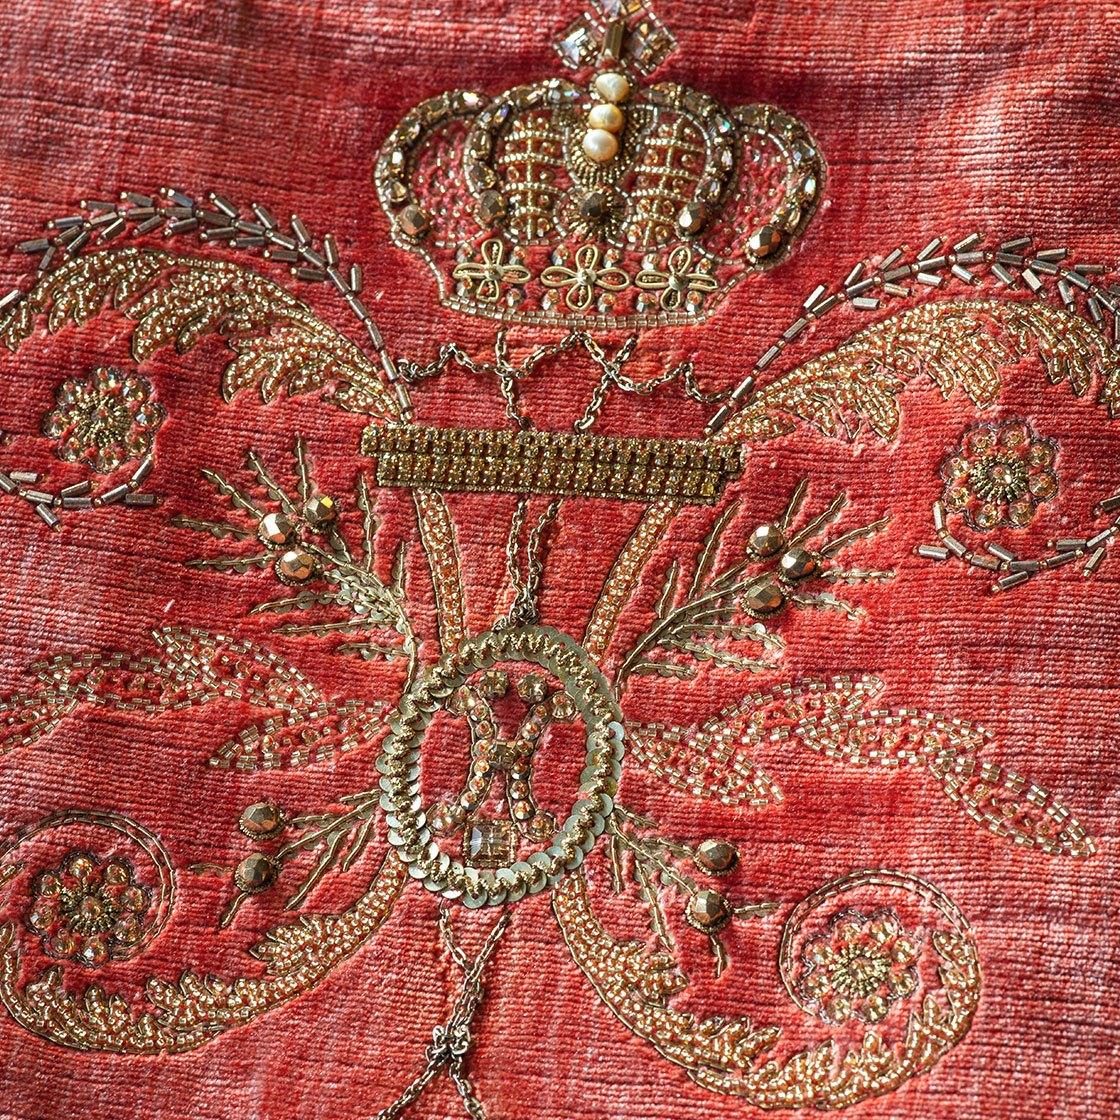 Imperatore - On Como Silk Velvet Pompeiian Red - Beaumont & Fletcher - Beaumont & Fletcher